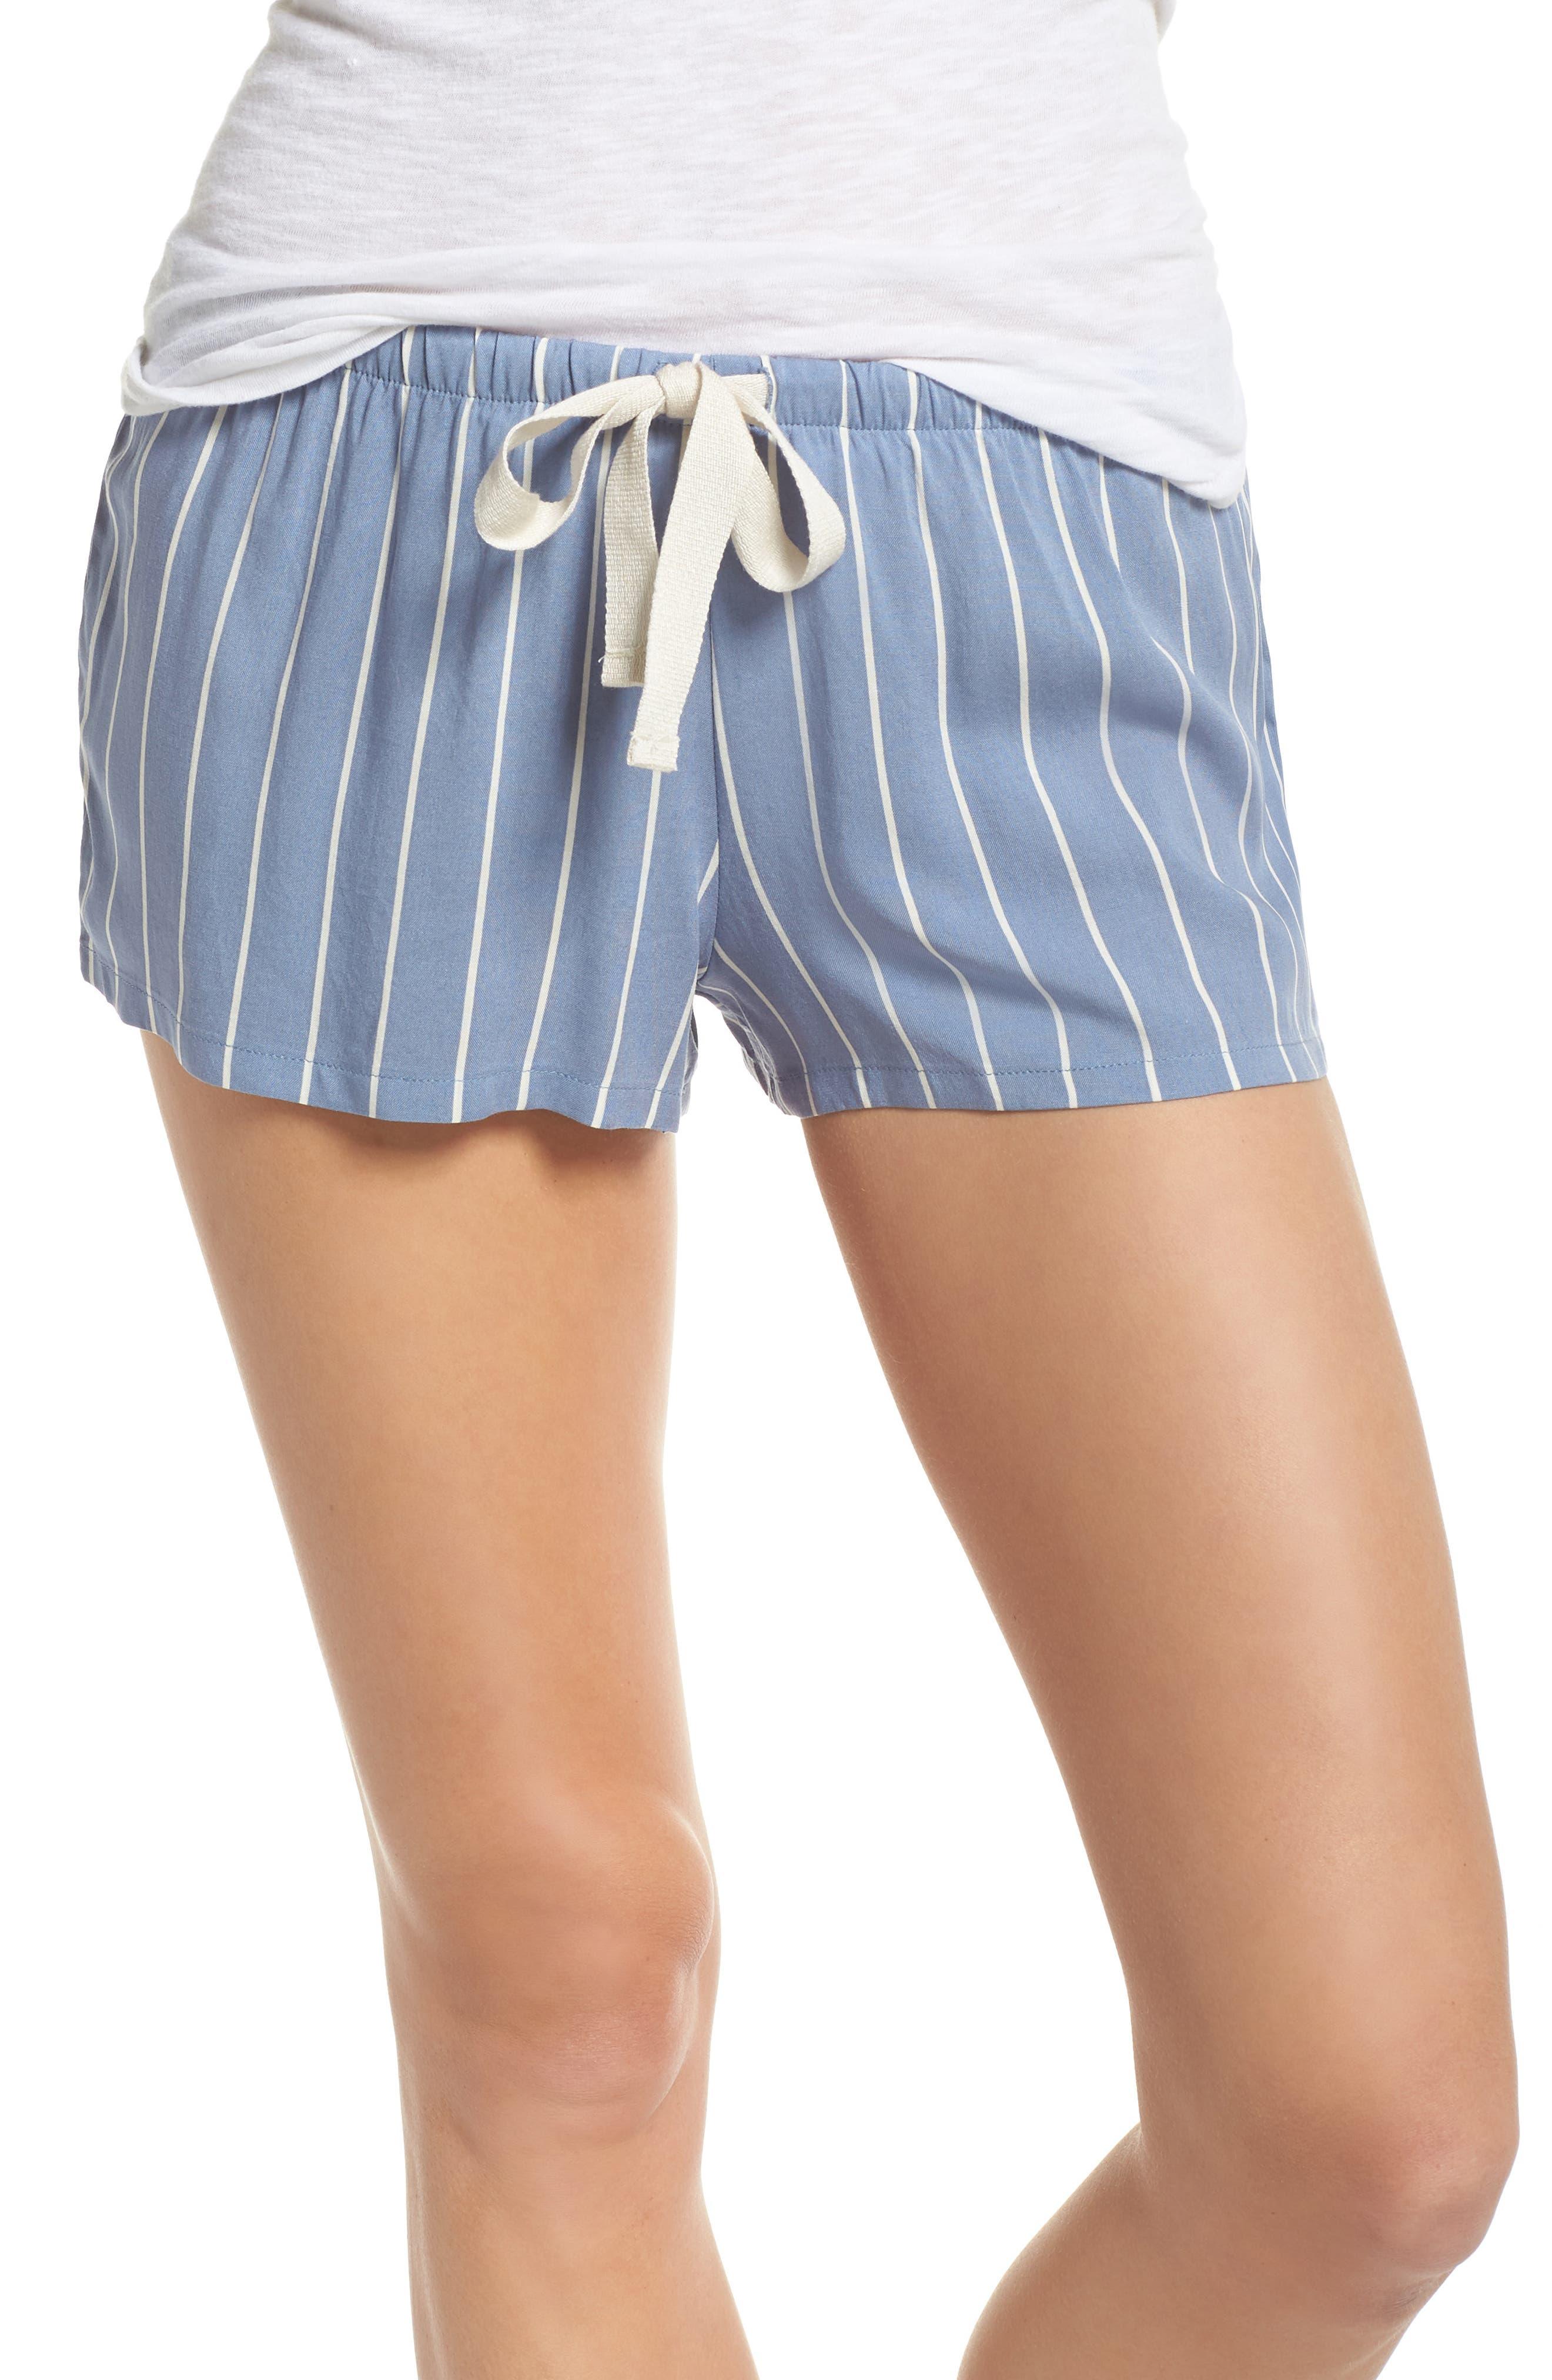 Joe's Poplin Pajama Shorts